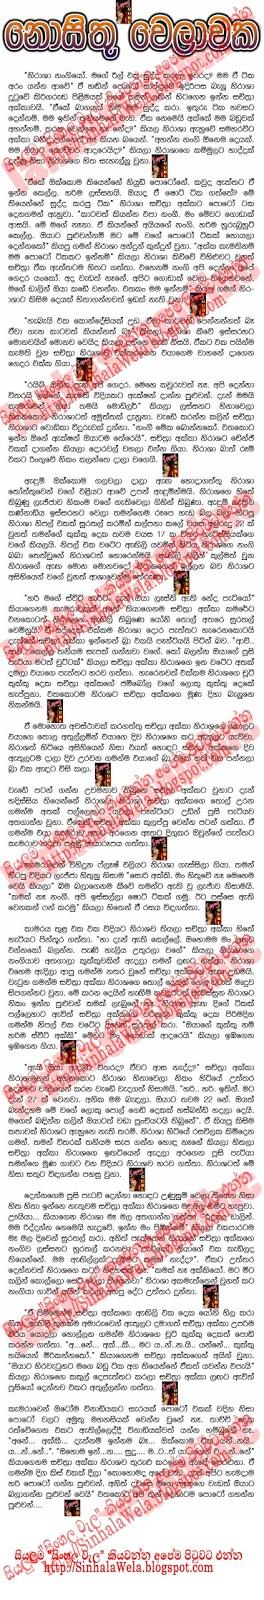 Sinhala wal katha aluth site eka websites and posts on sinhala wal